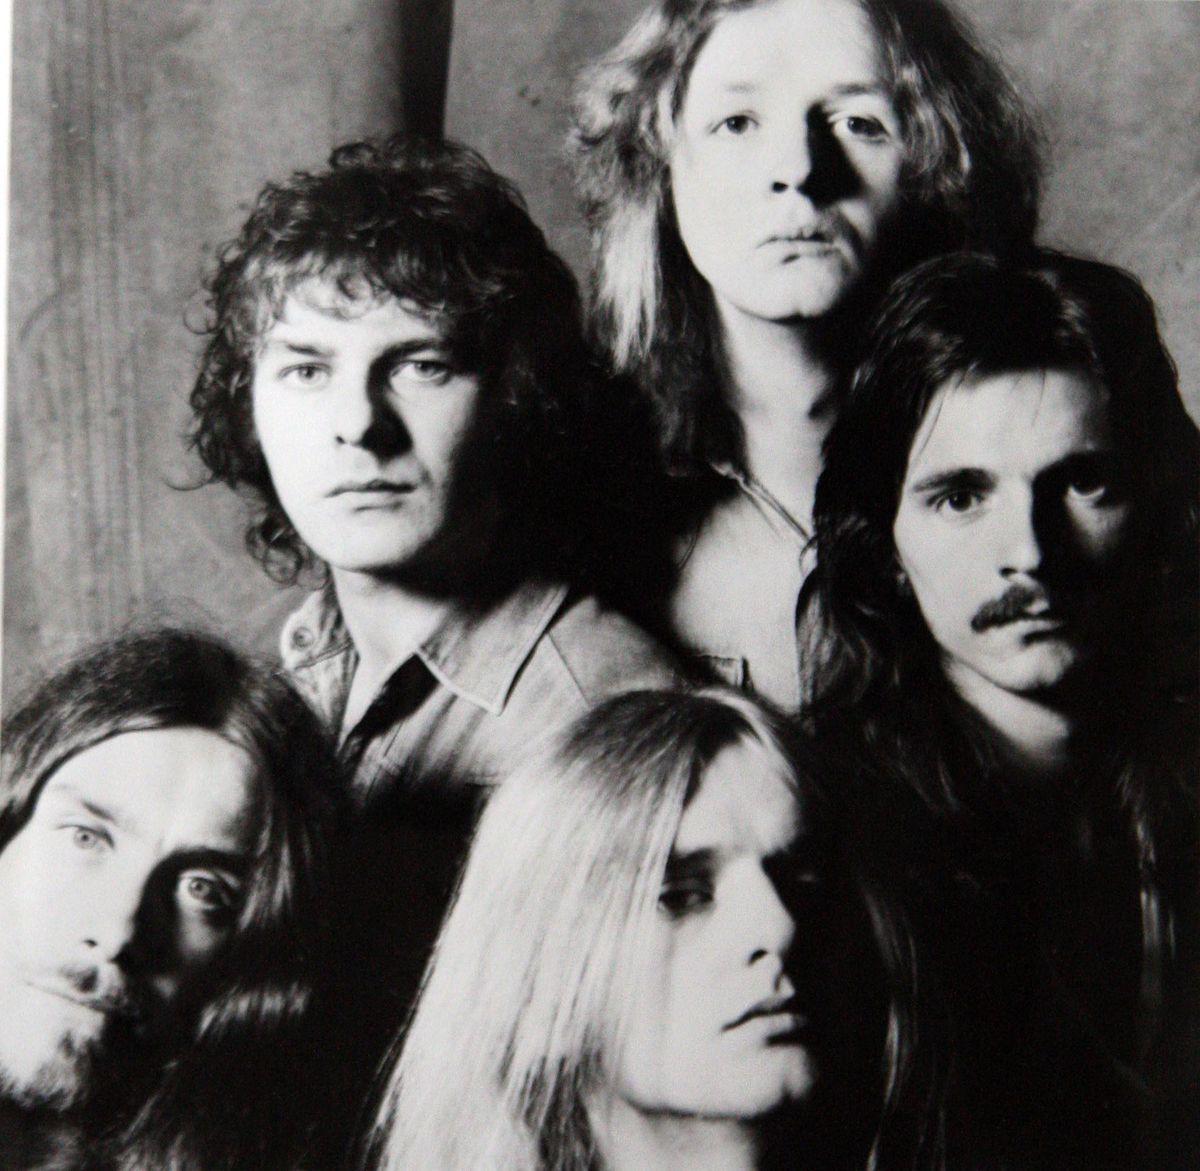 Judas Priest in the 1970s.